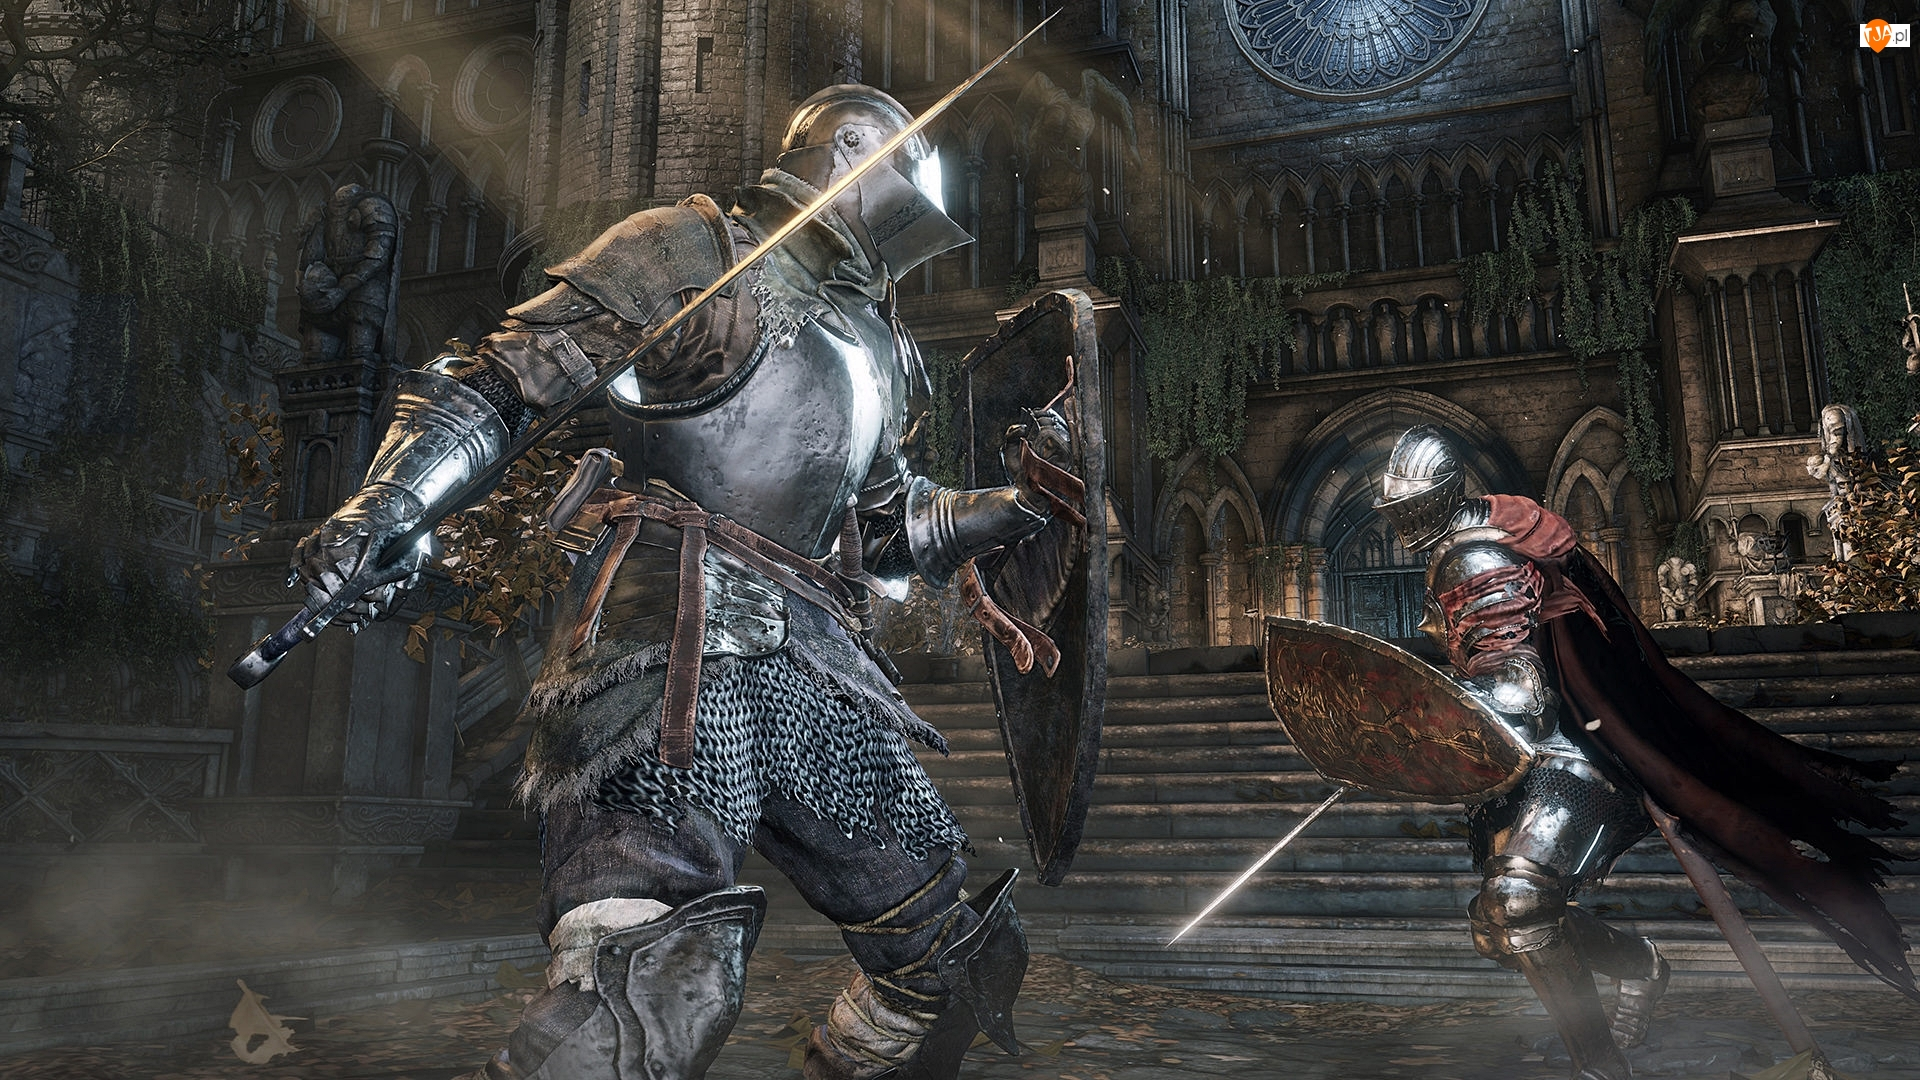 Gra, Walka, Dark Souls 3, Rycerze